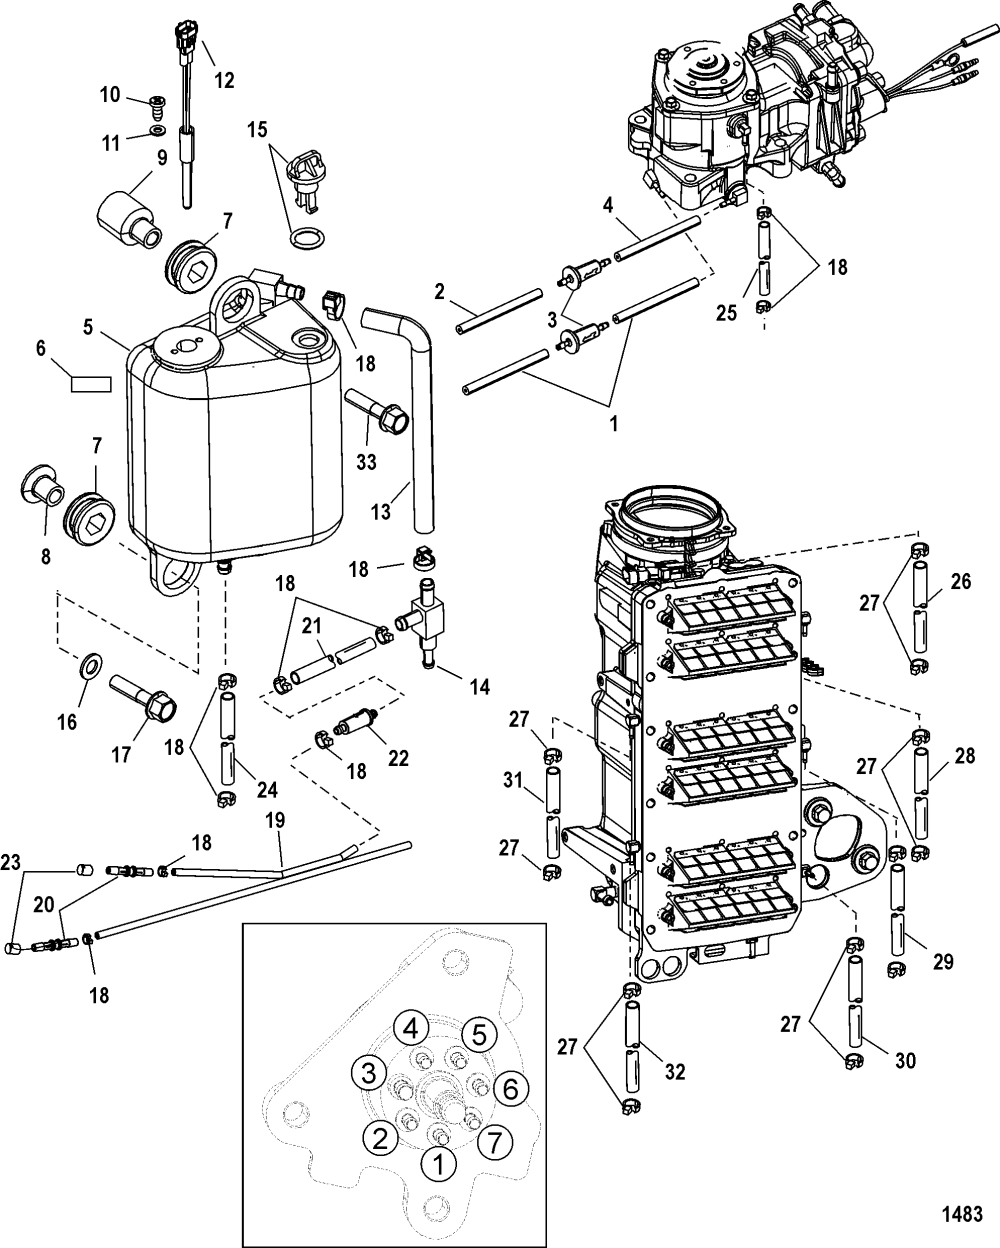 medium resolution of mercury optimax cooling system diagram imageresizertool com mercury outboard wiring diagram kill switch mercury outboard wiring